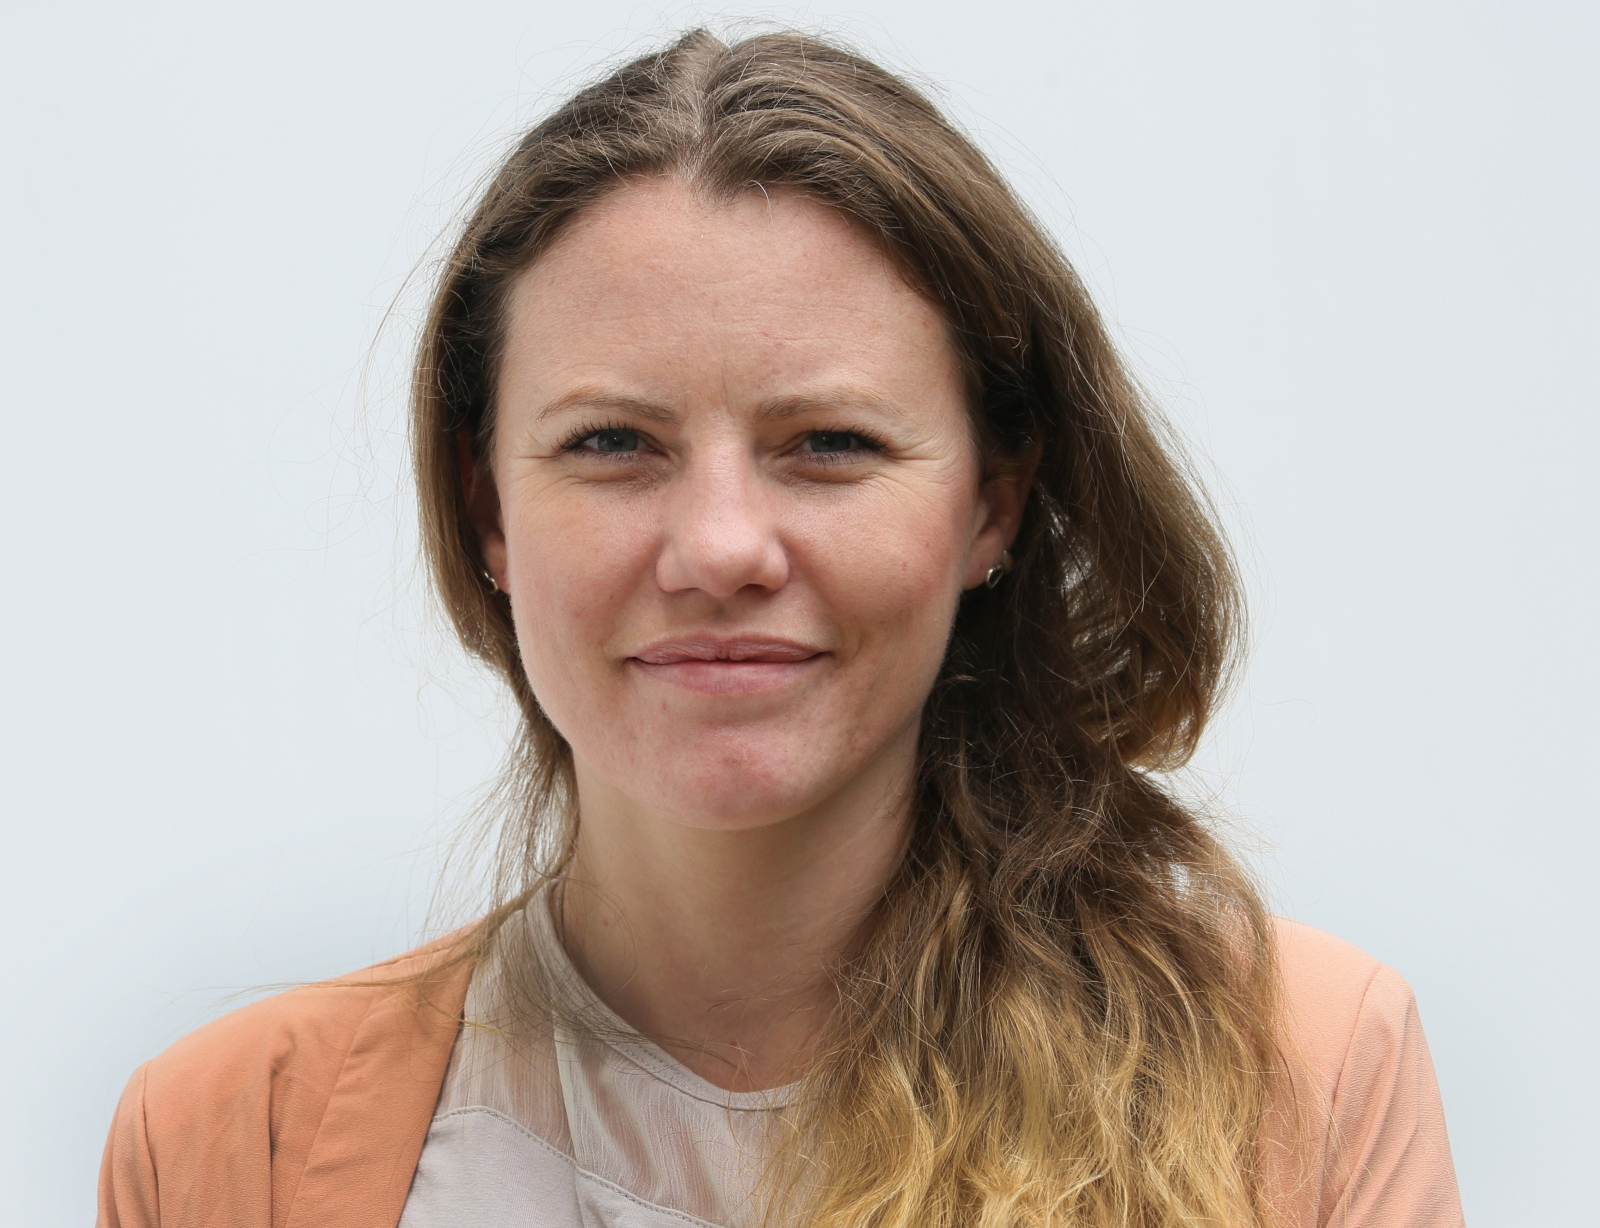 WikiLeaks Sarah Harrison